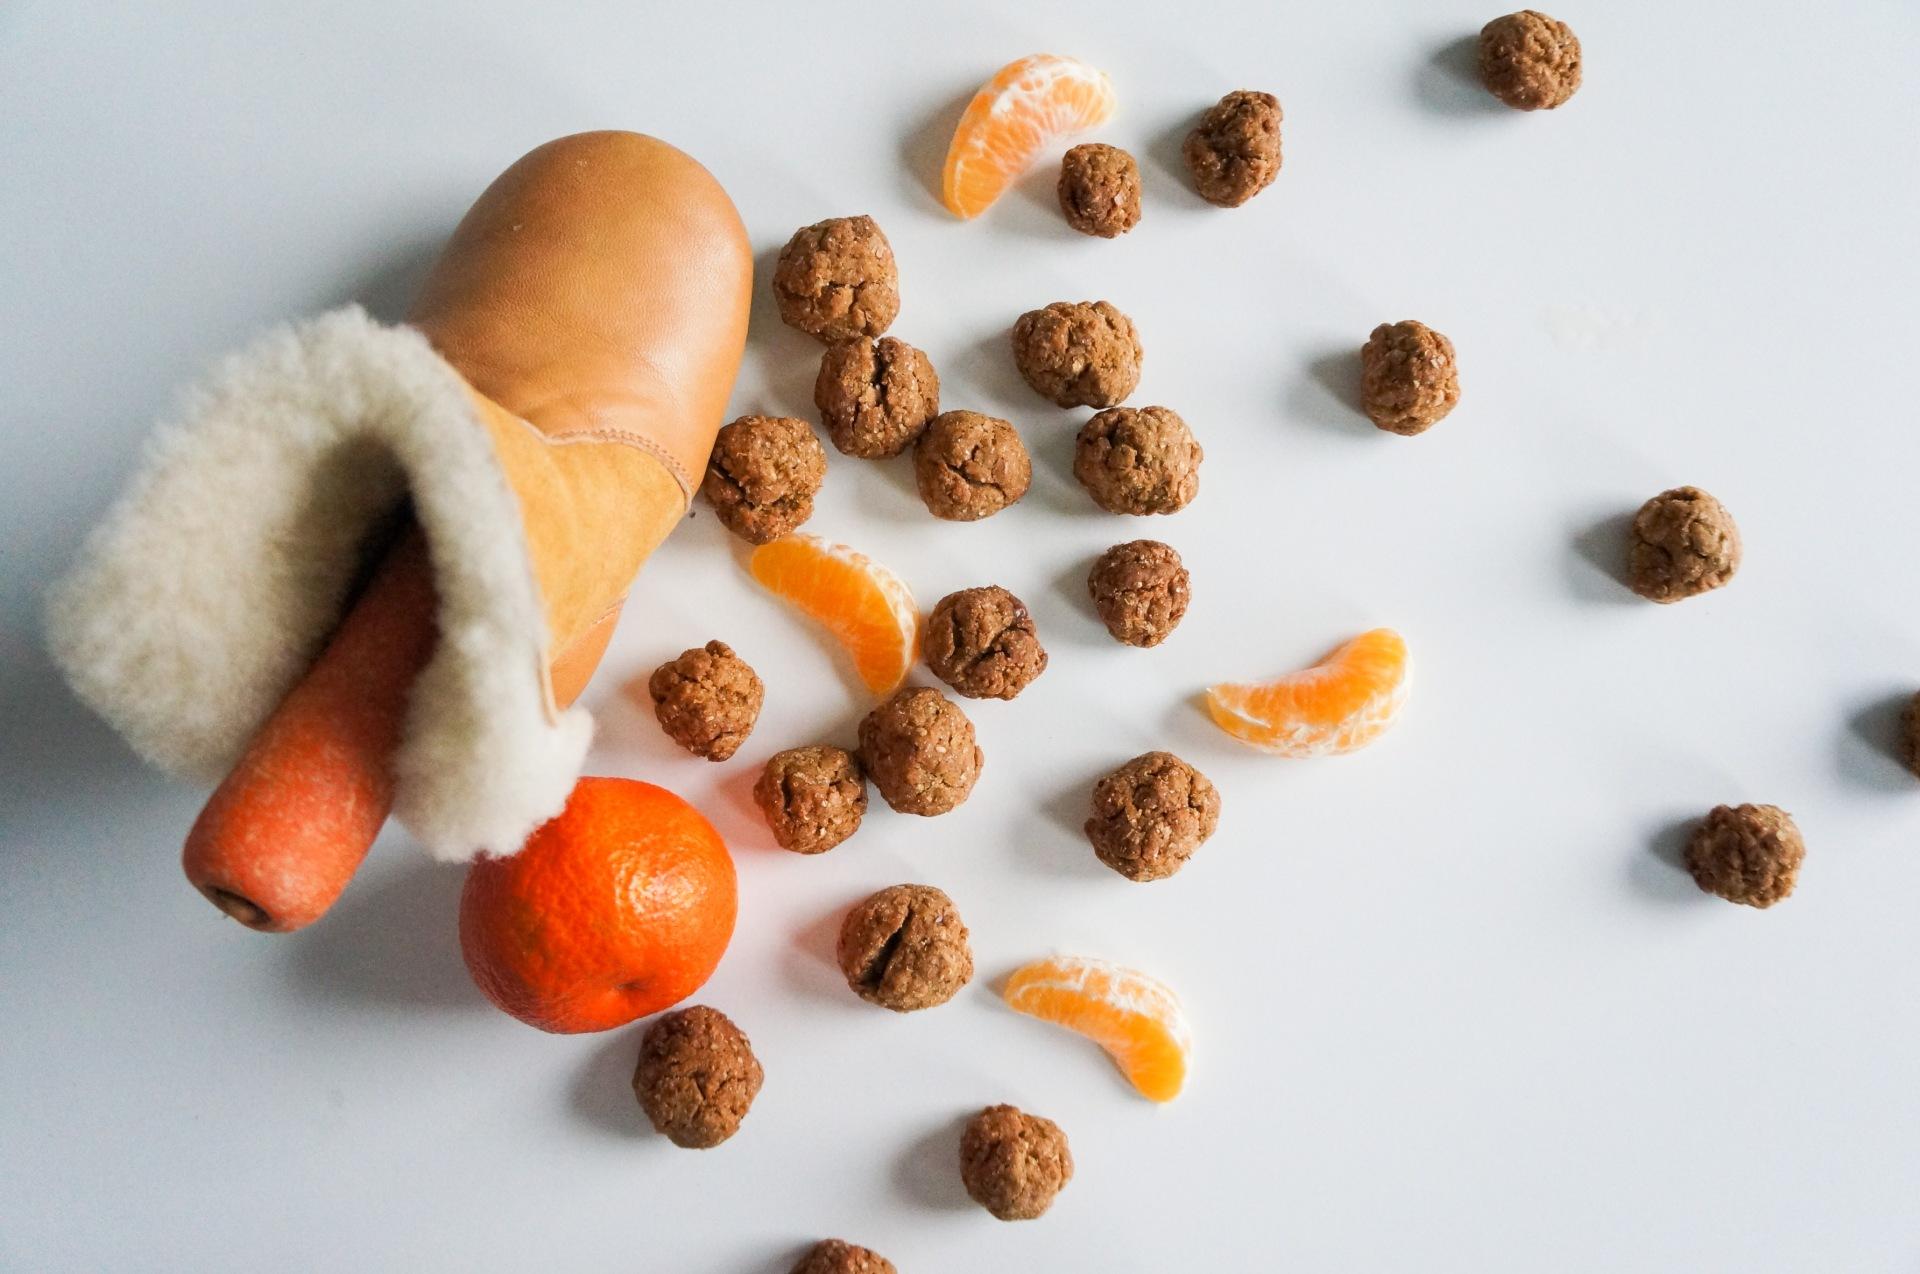 kruidnoten en mandarijn